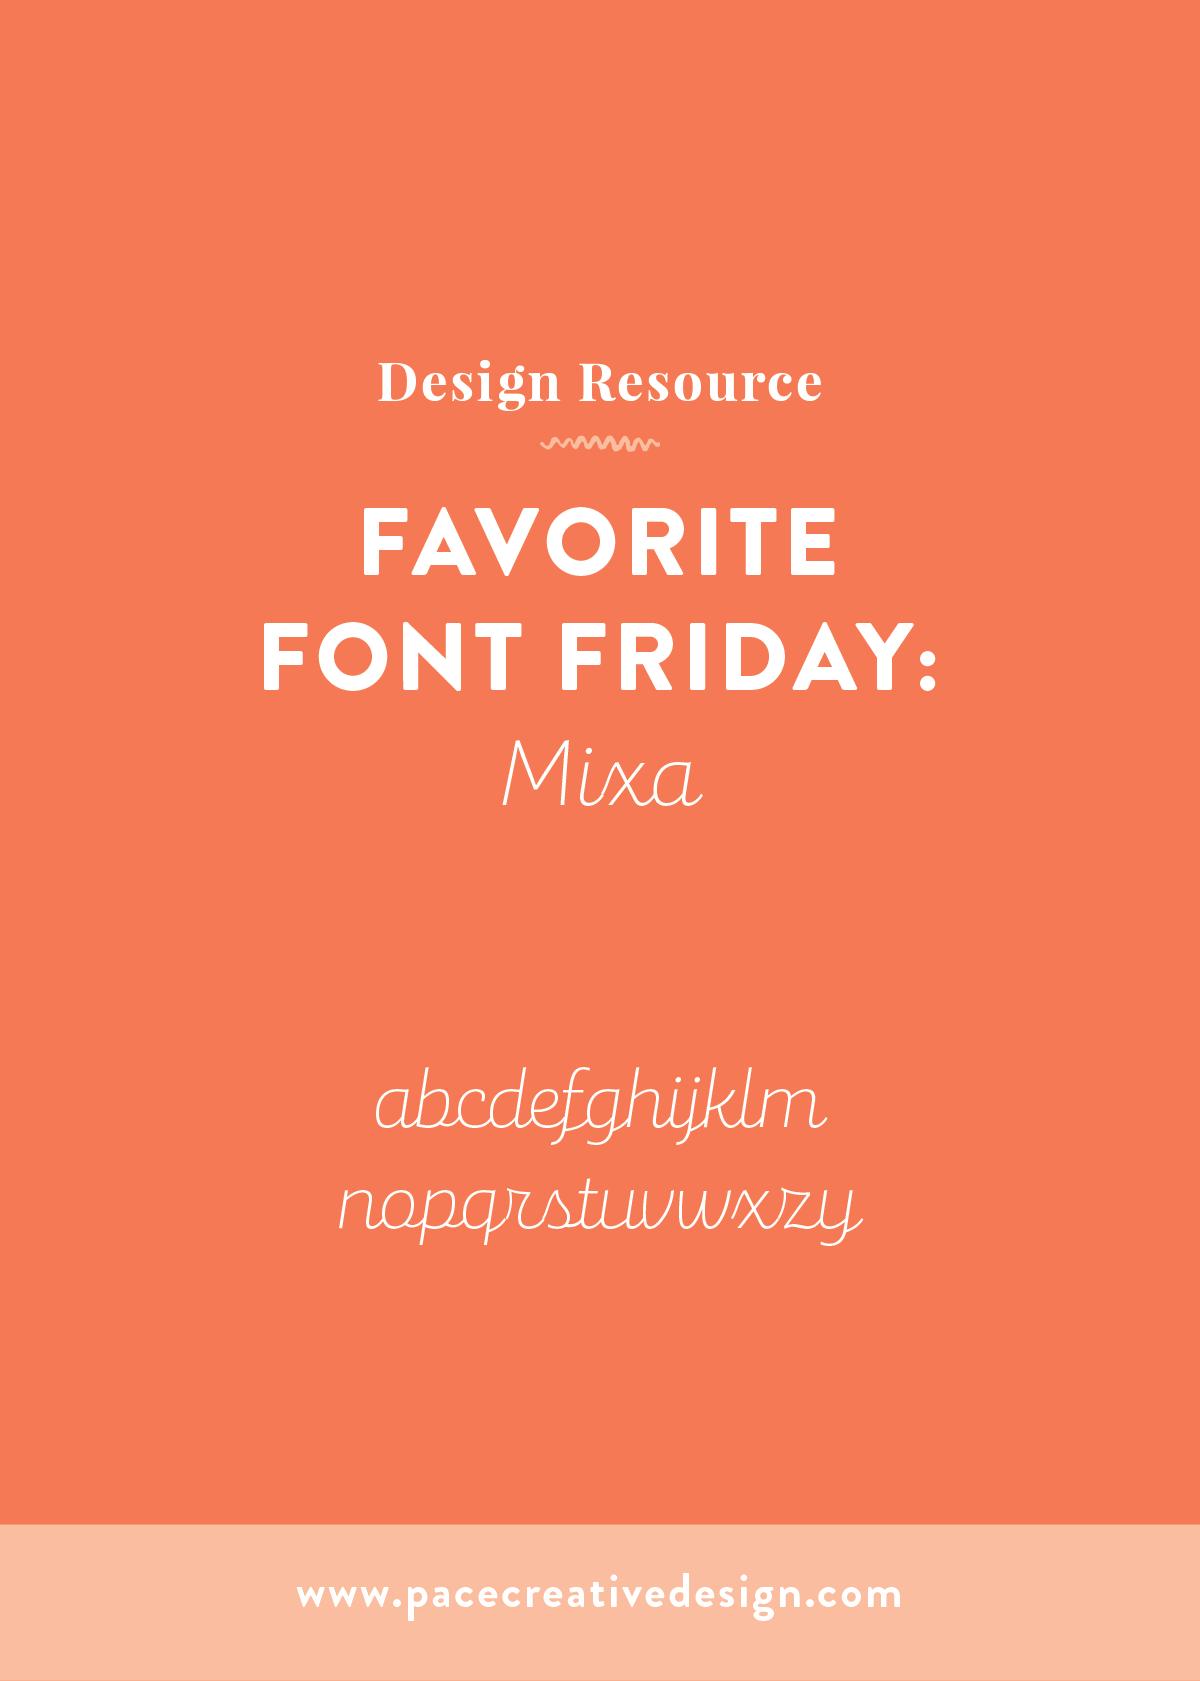 Favorite Font Friday no. 5: Mixa | Pace Creative Design Studio